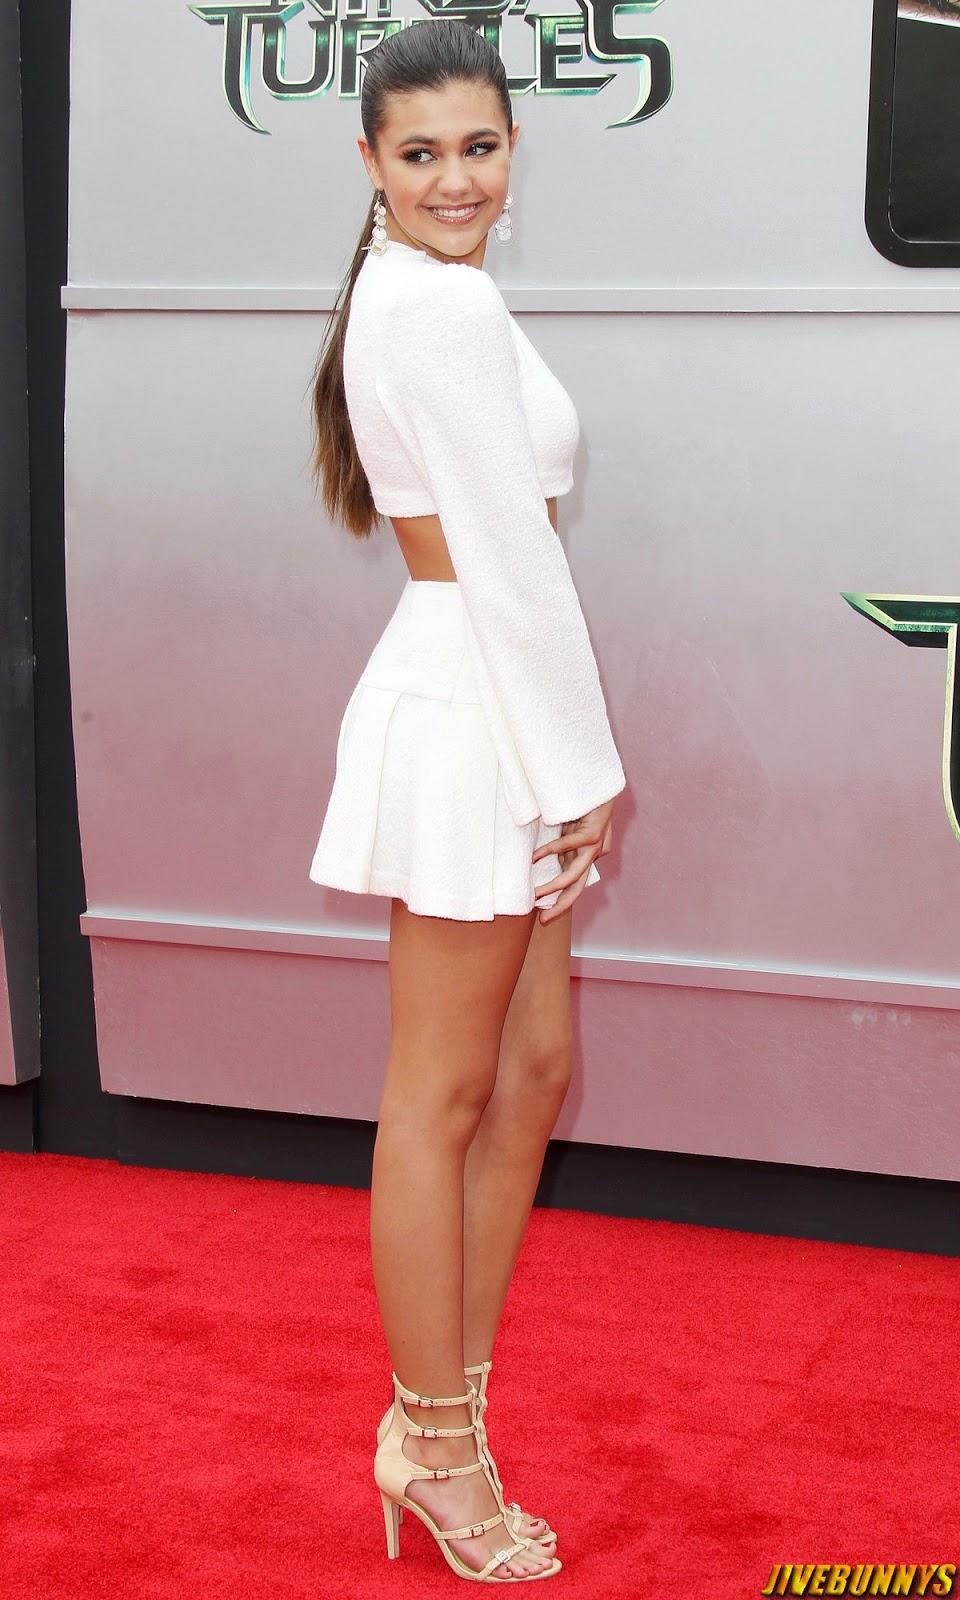 Jivebunnys Female Celebrity Picture Gallery: Amber Montana Actress ...